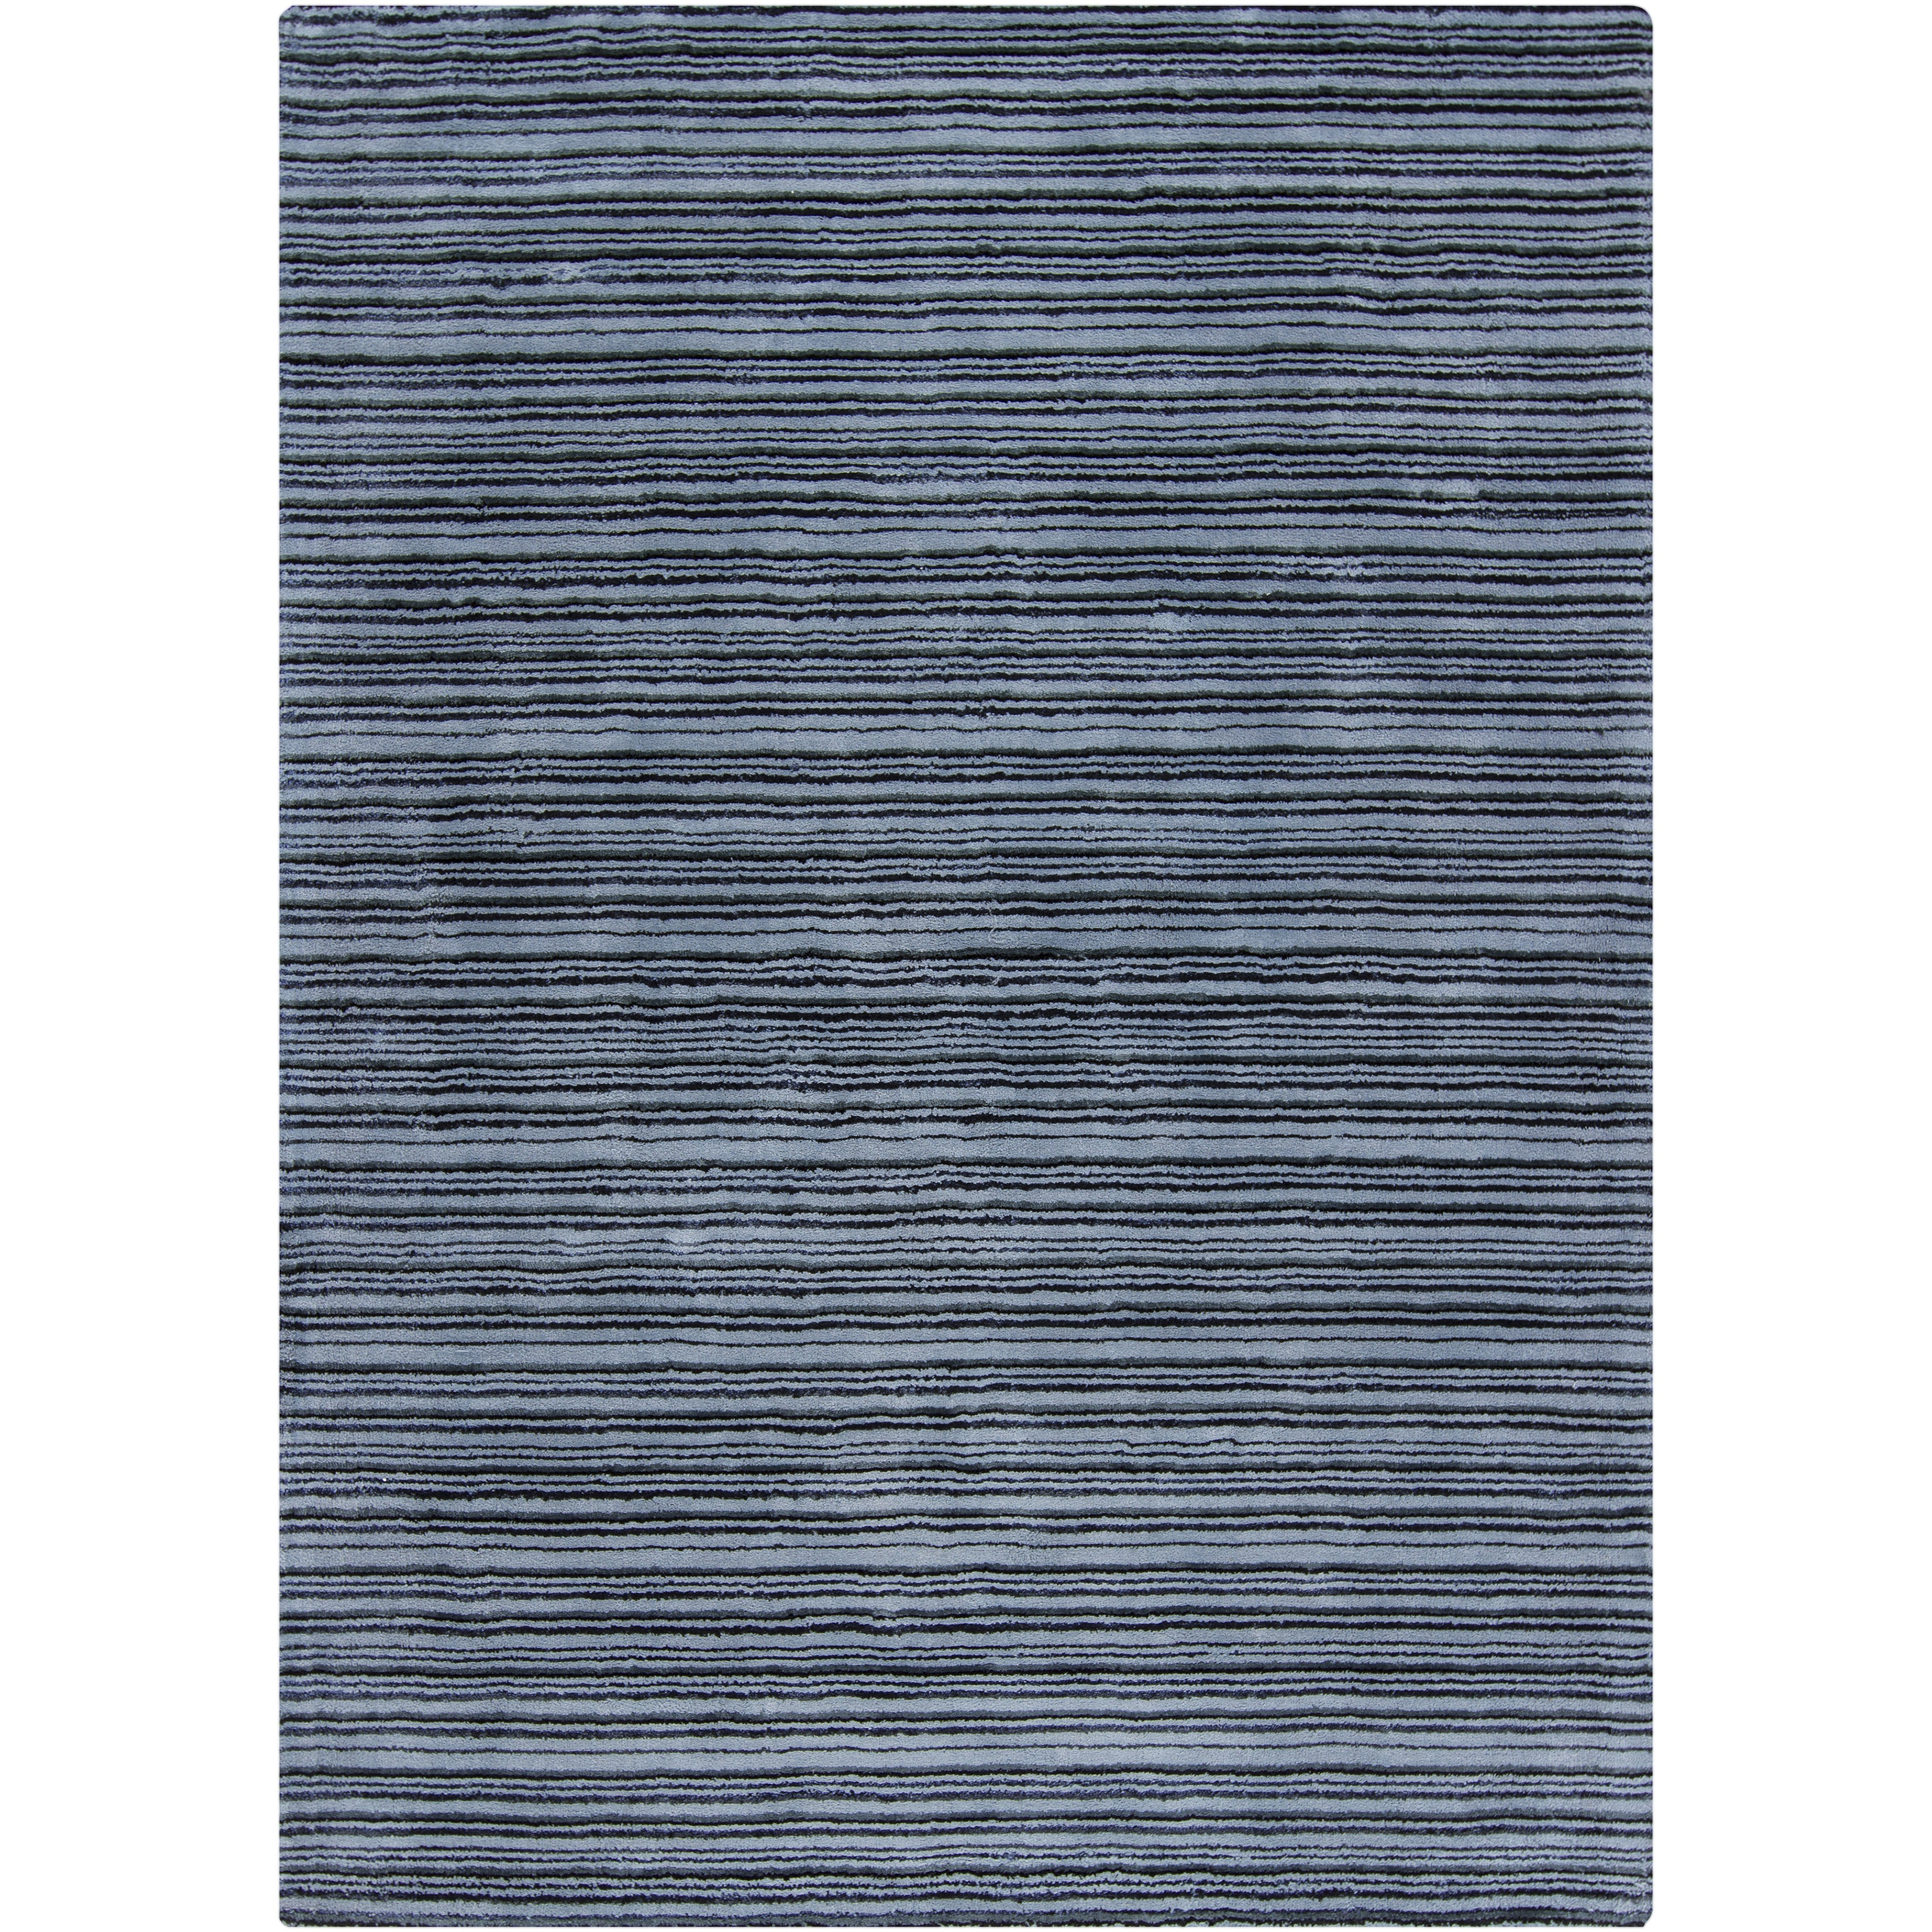 Mandara Hand-Woven Gray Stripes Area Rug